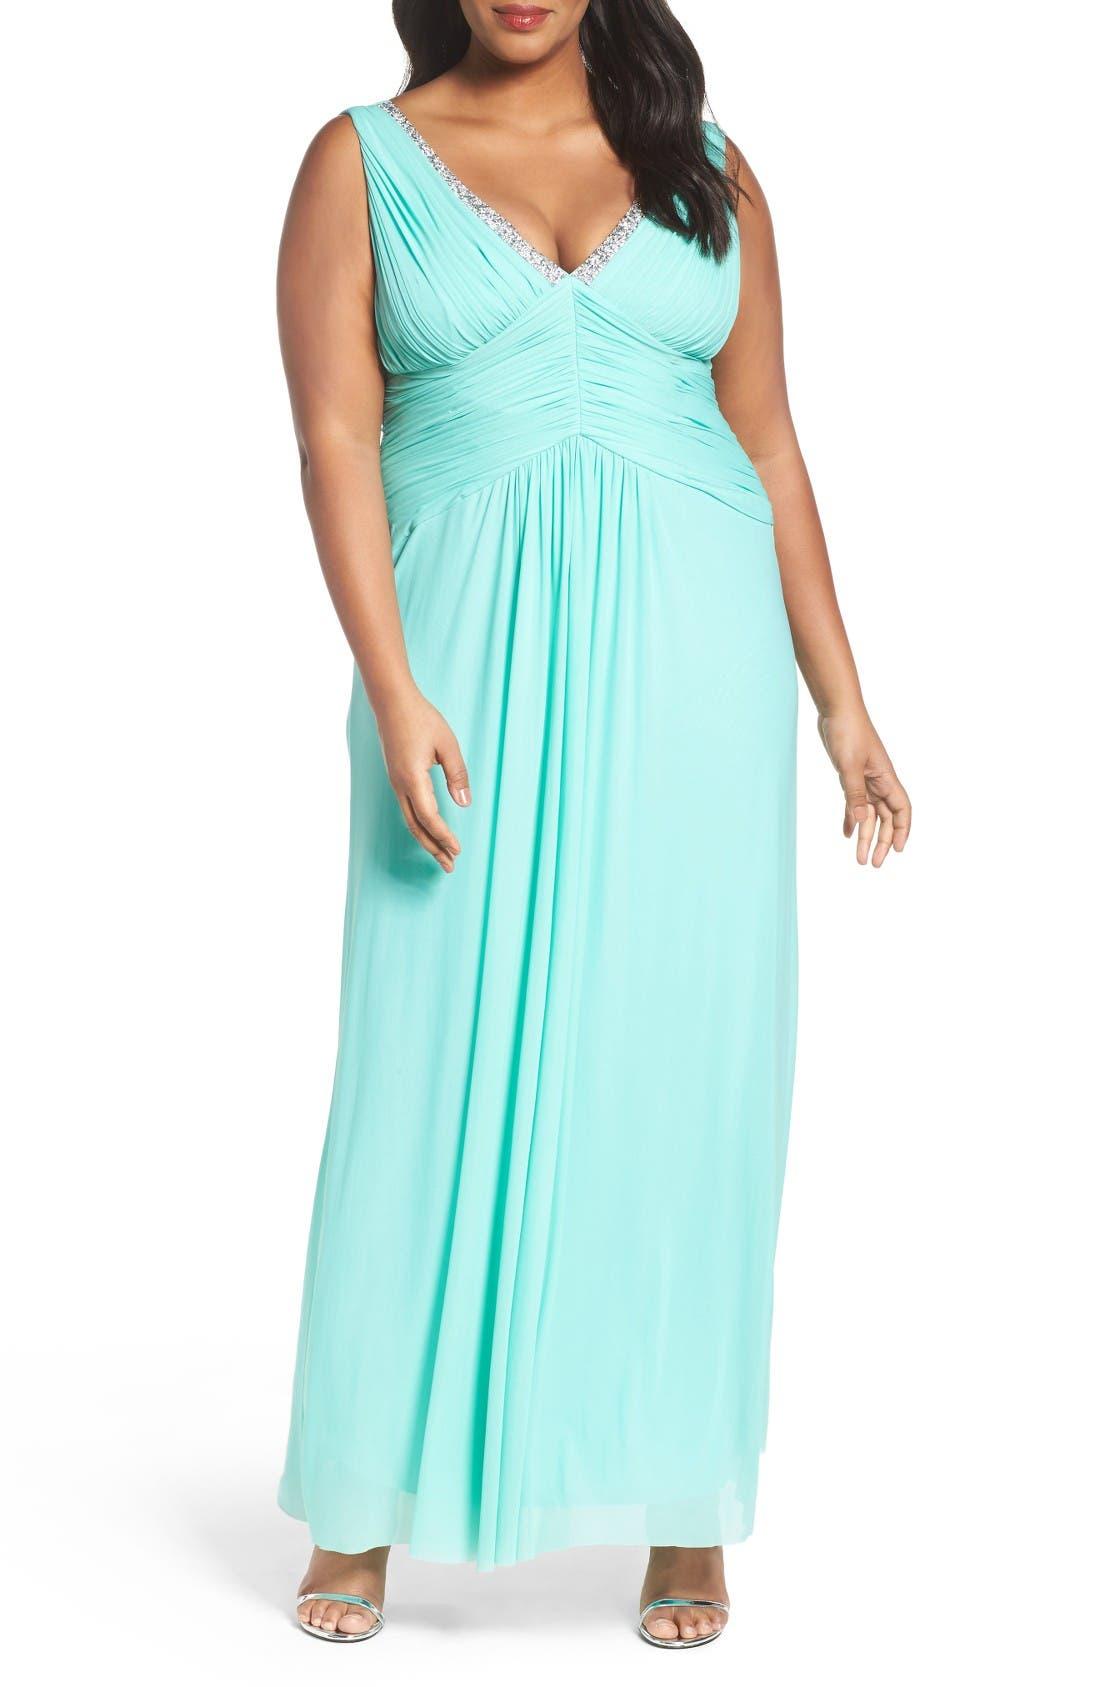 Alternate Image 1 Selected - Marina Beaded V-Neck Pleat Mesh Gown (Plus Size)